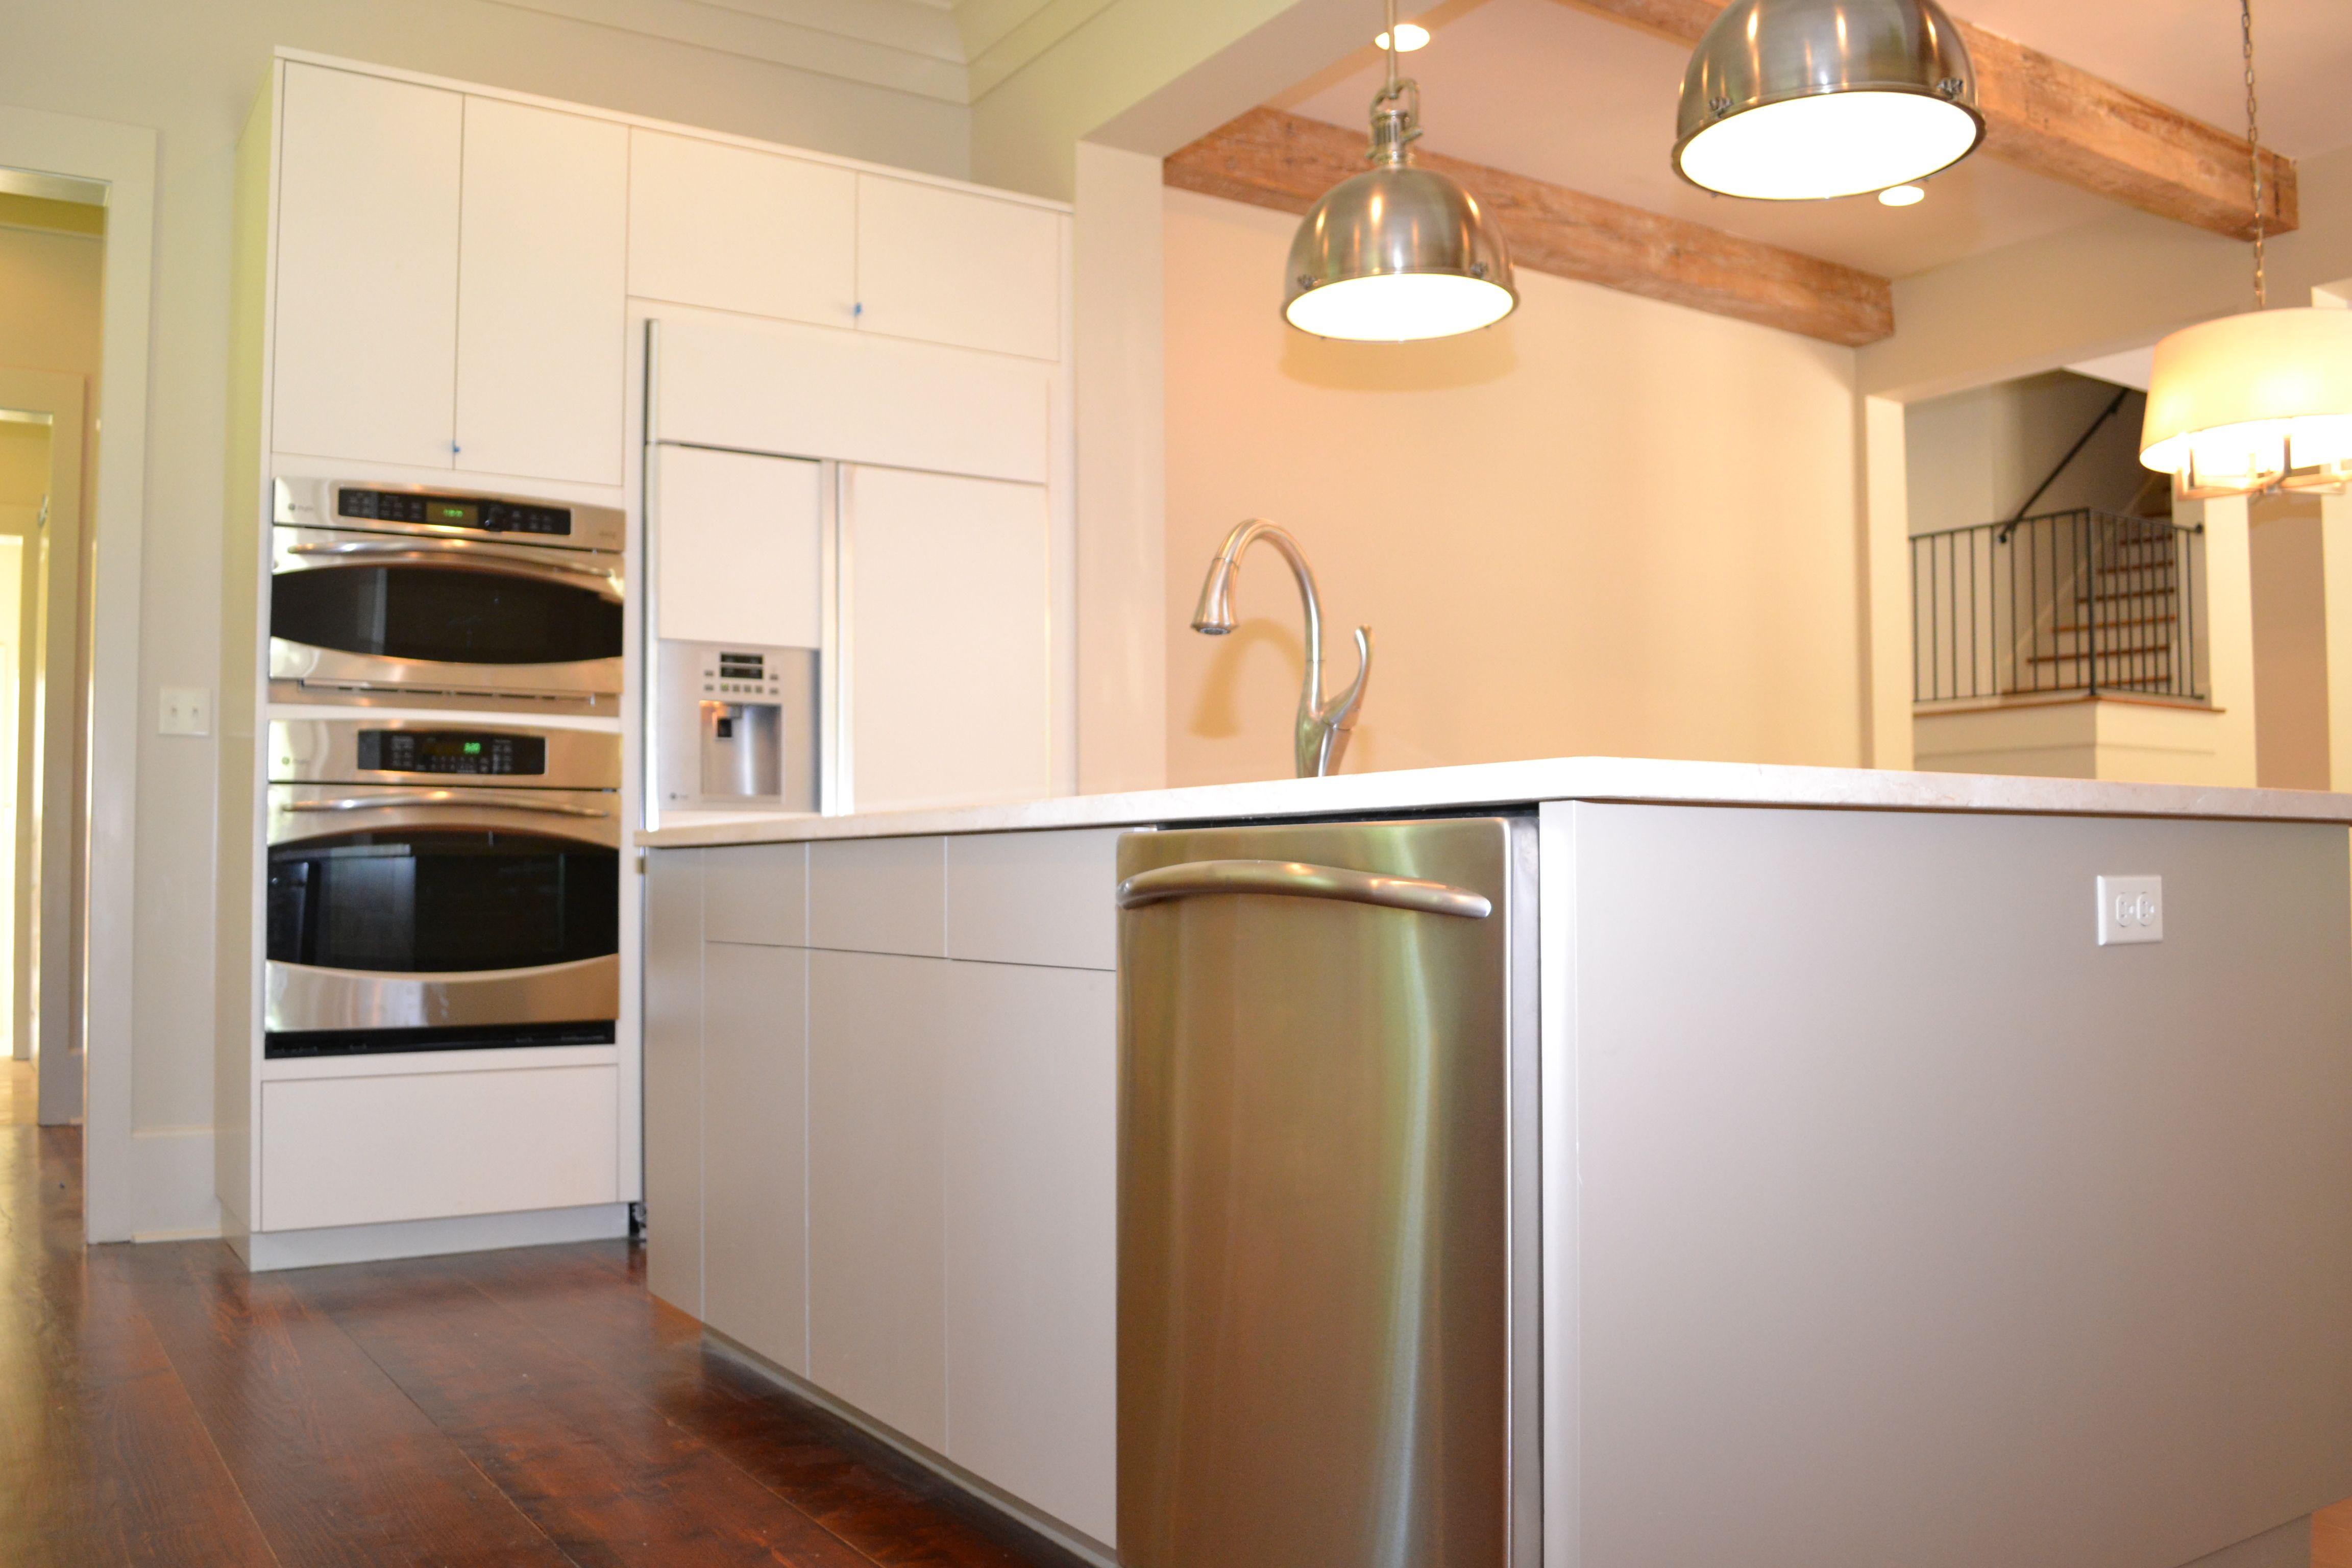 Euro style slab door modern kitchen for clean line look